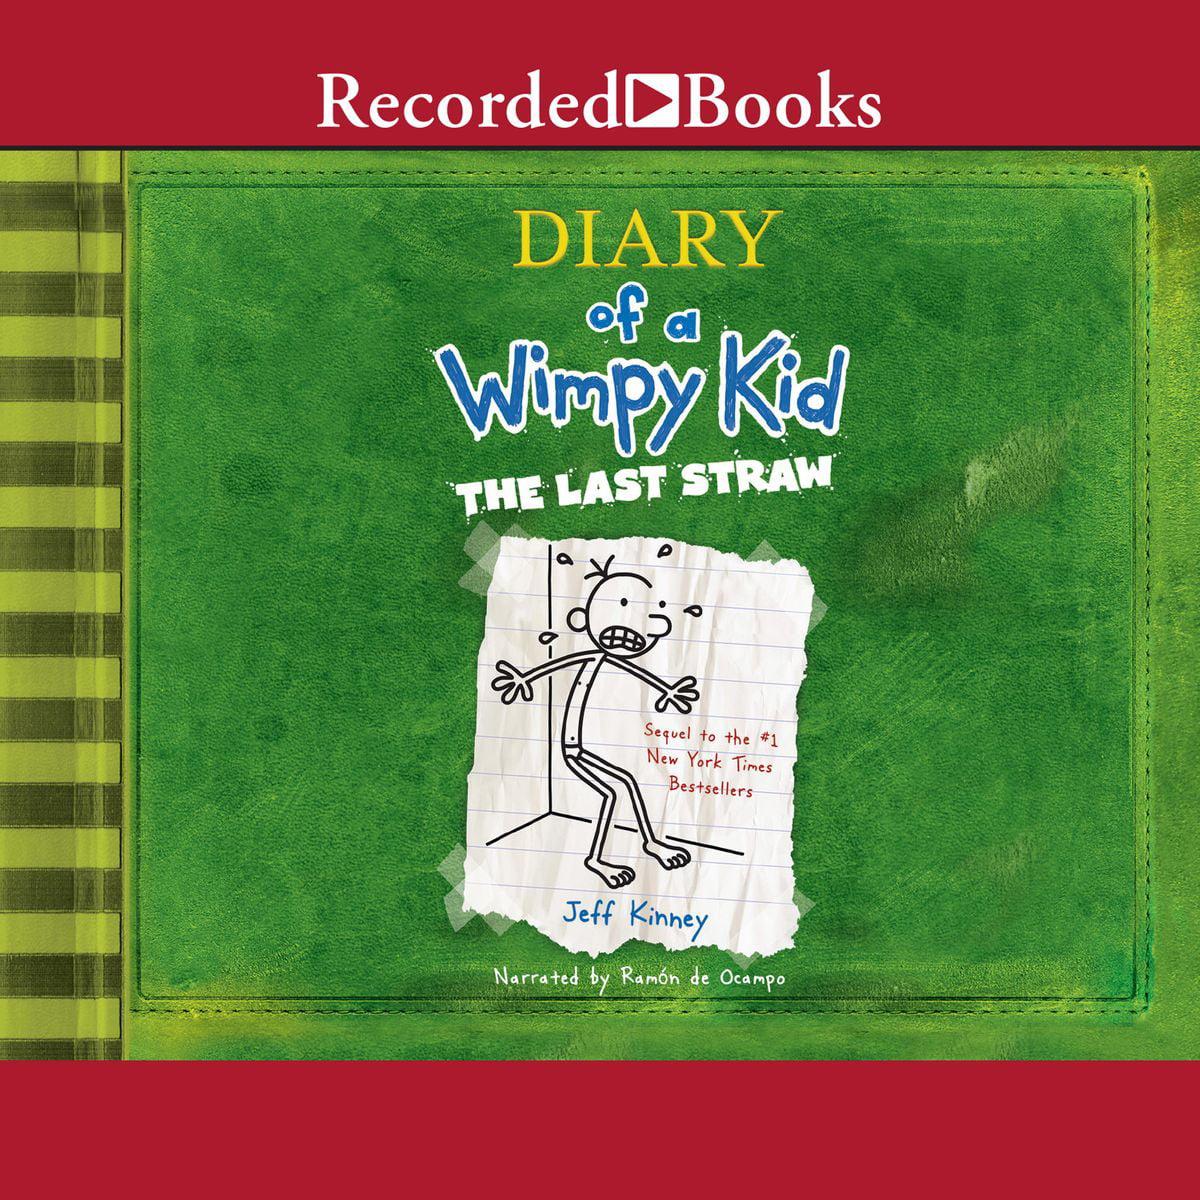 Diary Of A Wimpy Kid The Last Straw Audiobook Walmart Com Walmart Com